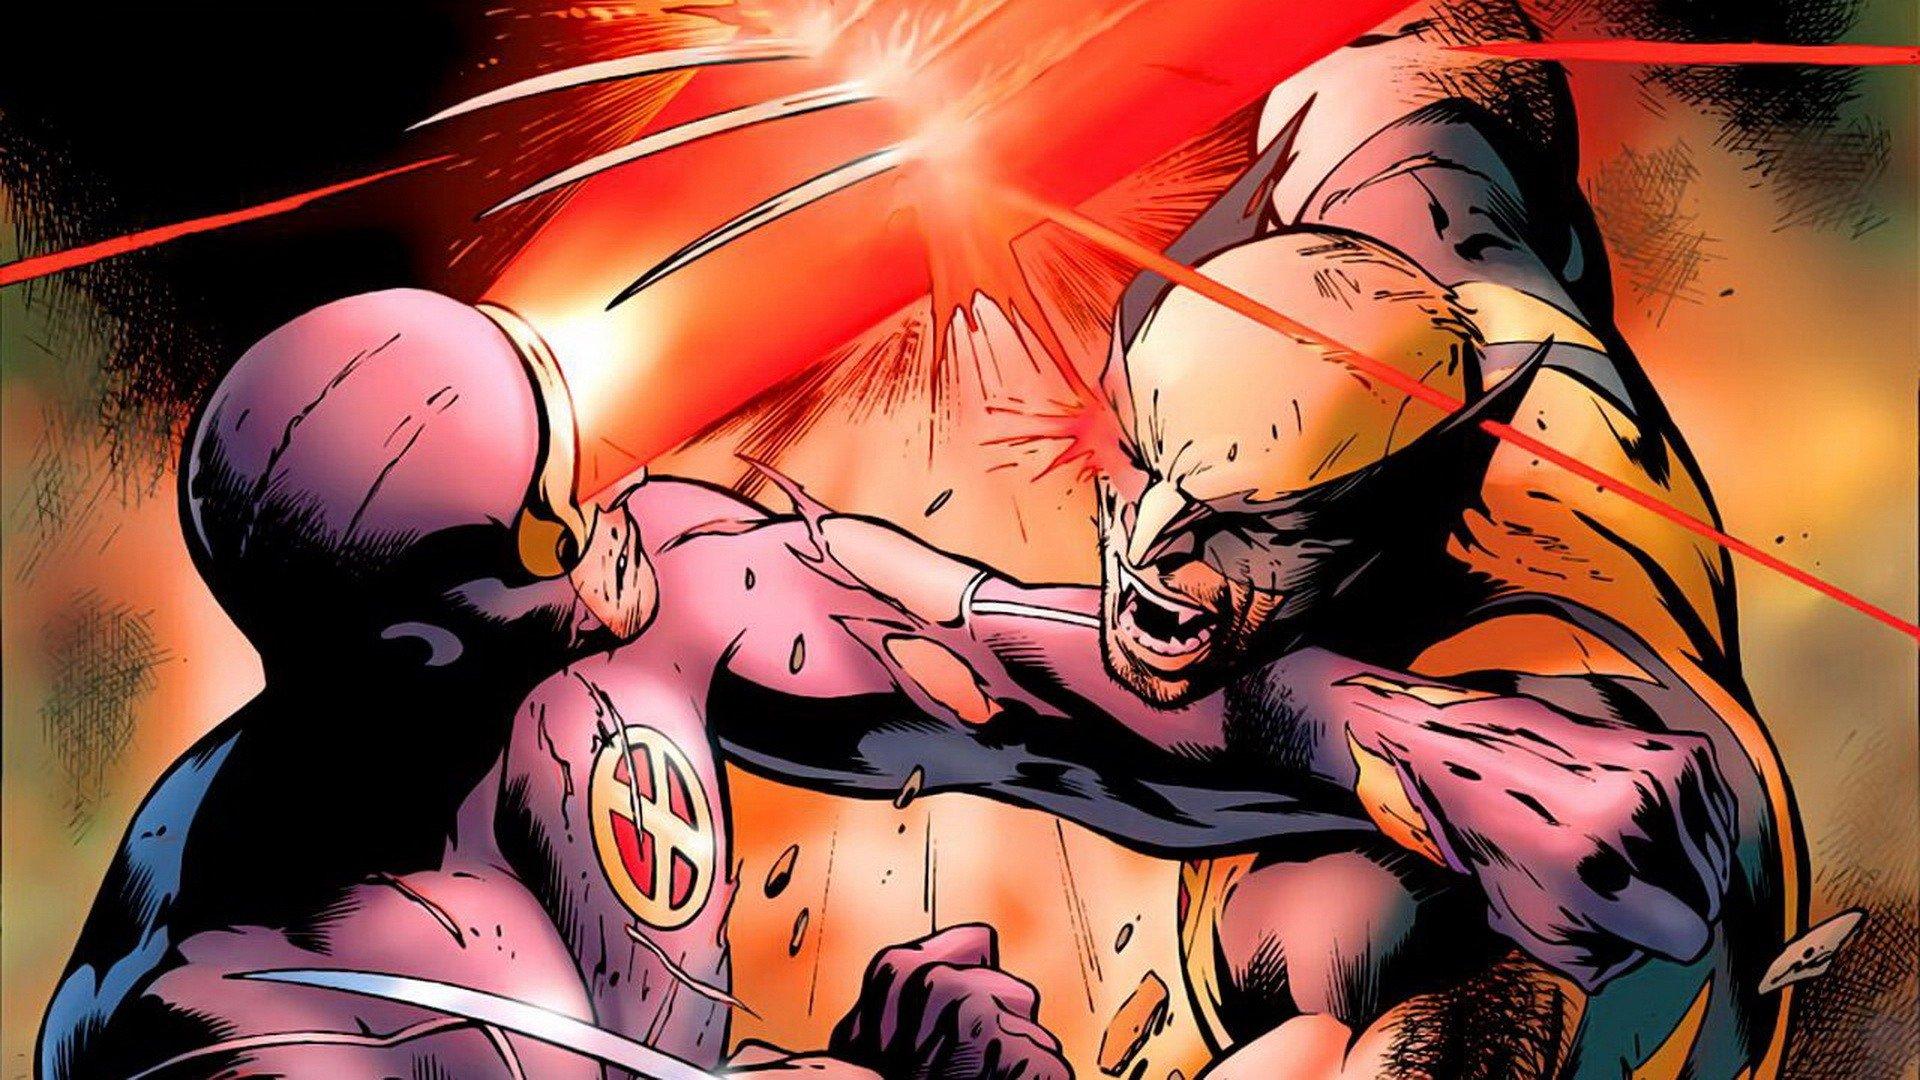 Xmen hentai sex comic wolverine cyclops